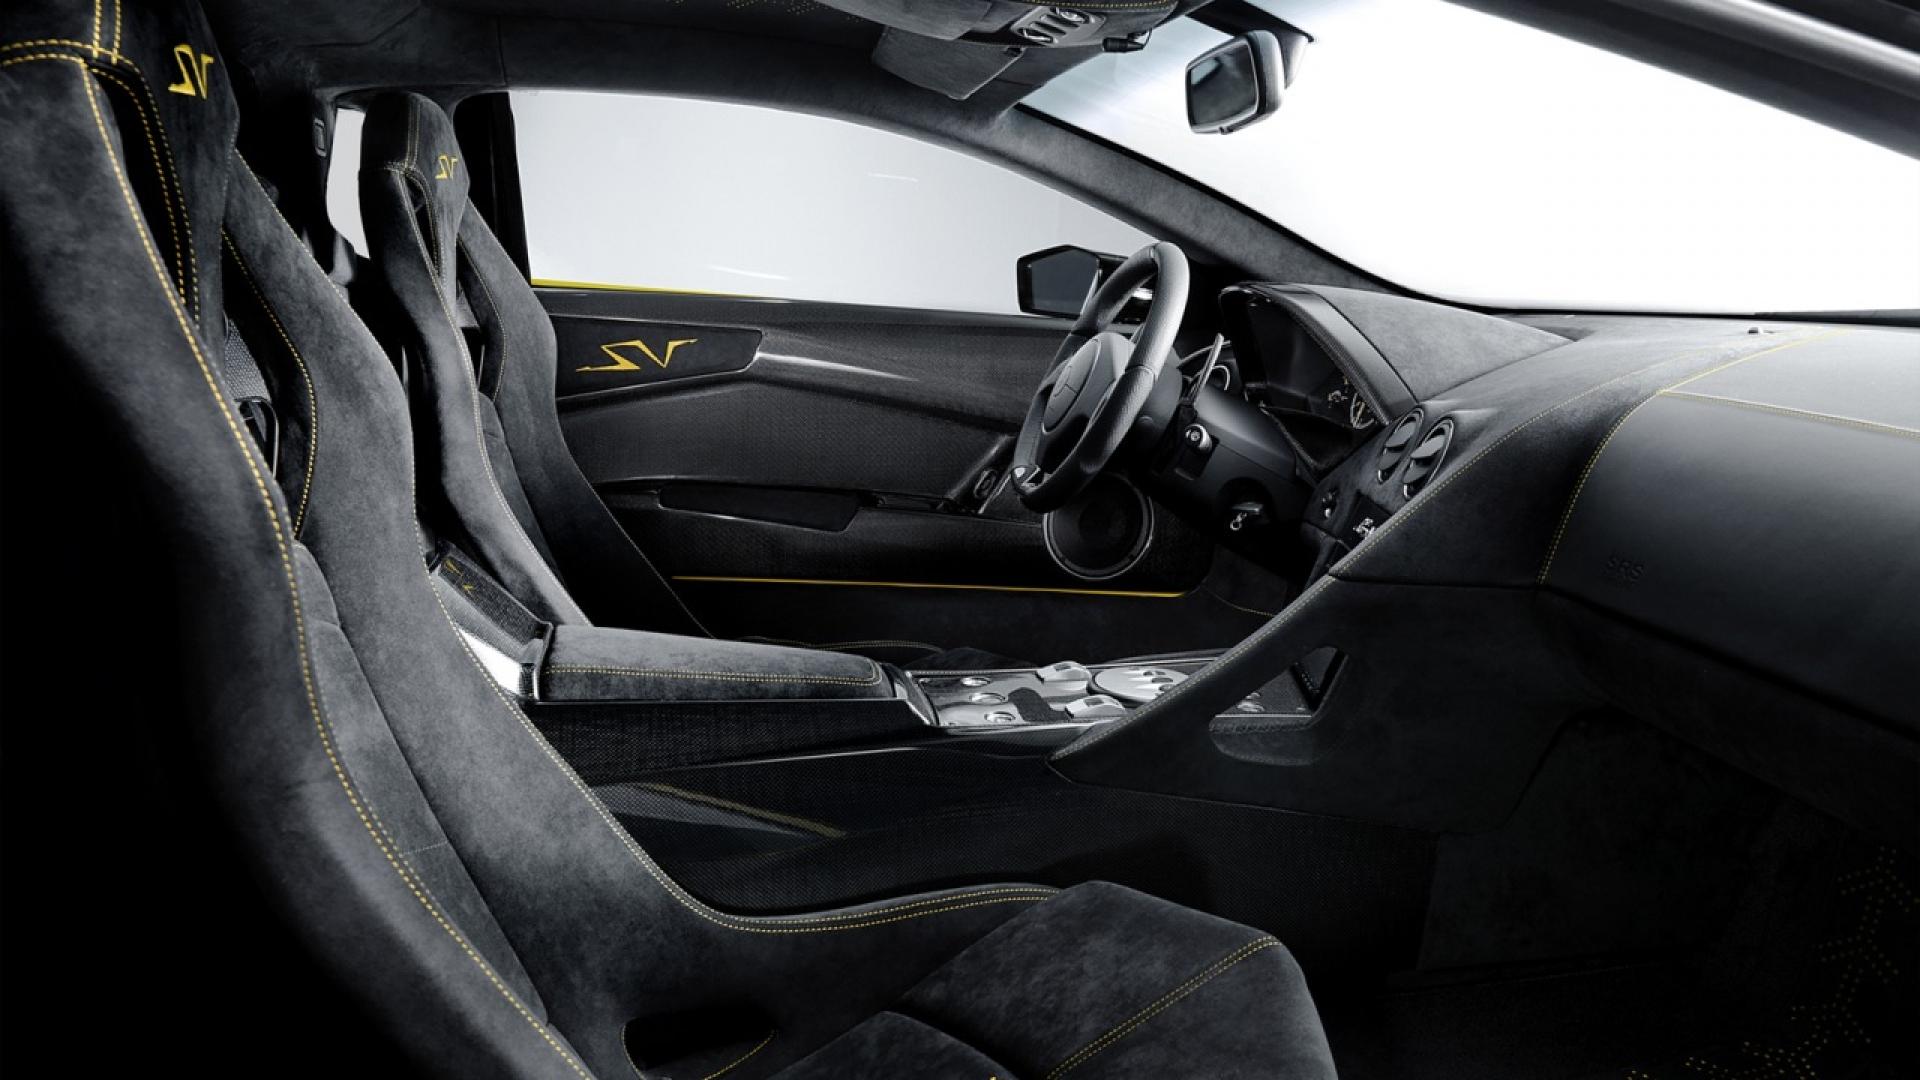 Good Wallpapers Iphone Inside A Lamborghini Hd Wallpapers